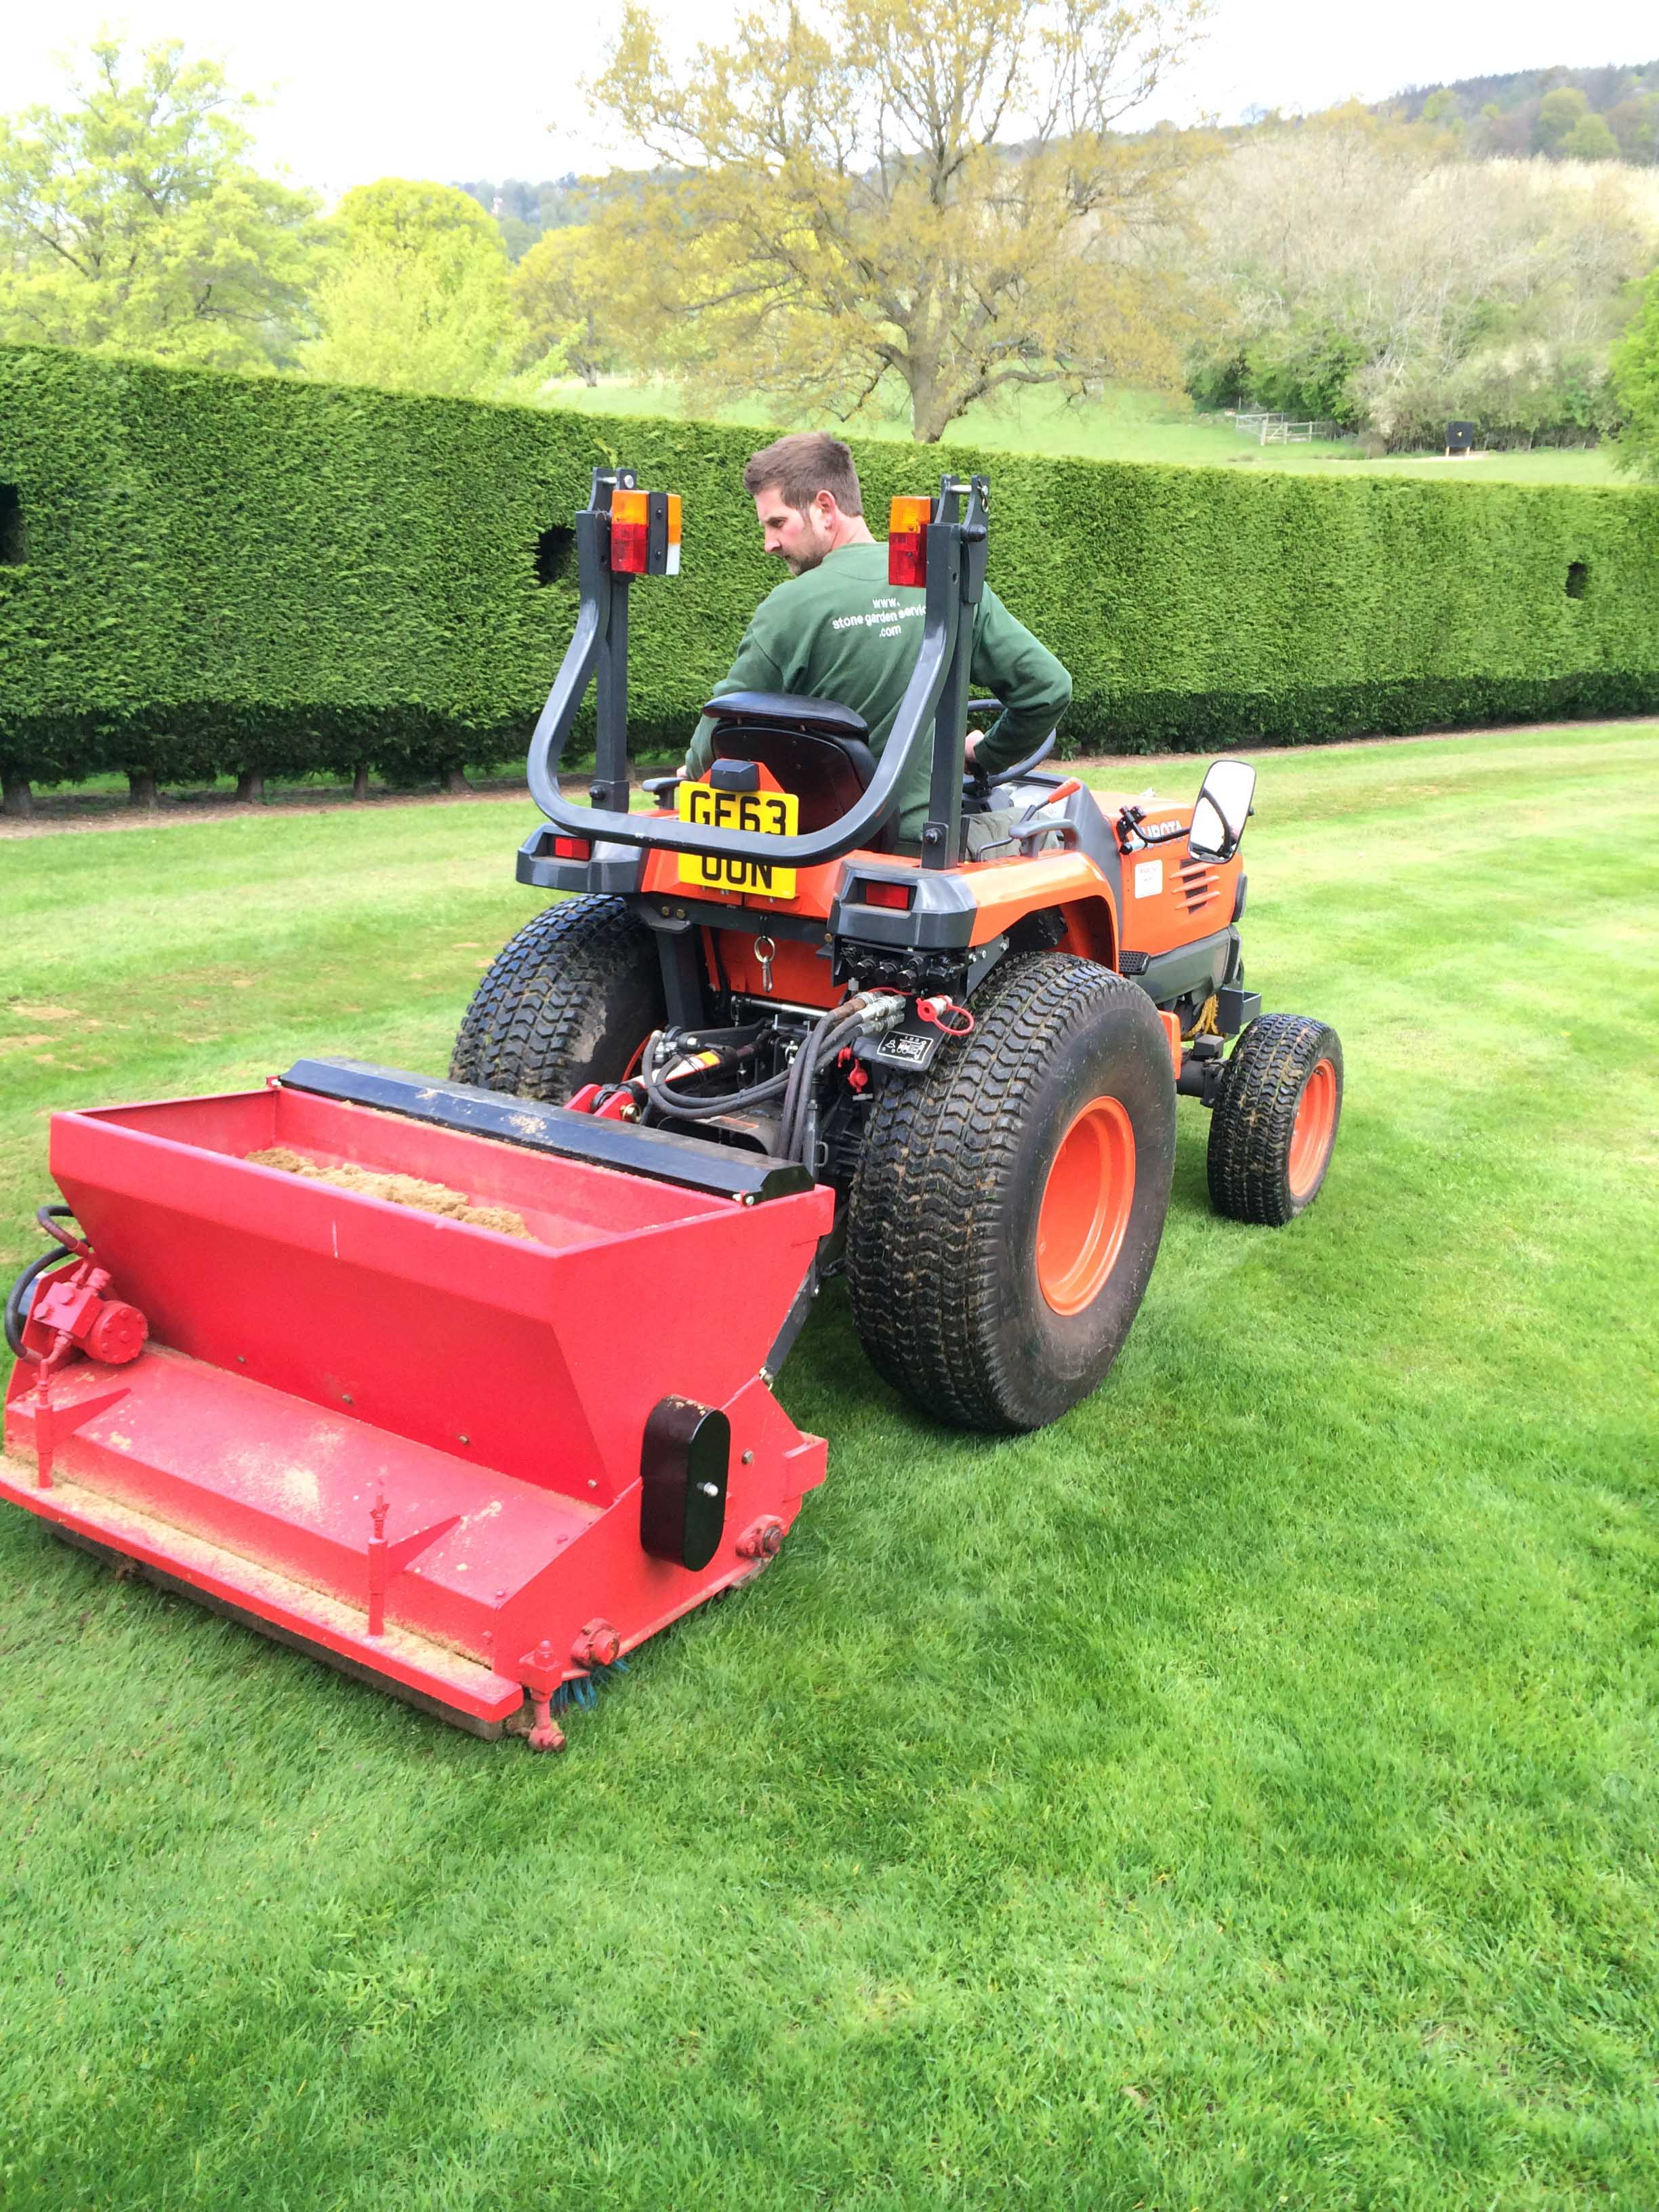 broad leaf ground maintenance 25.JPG